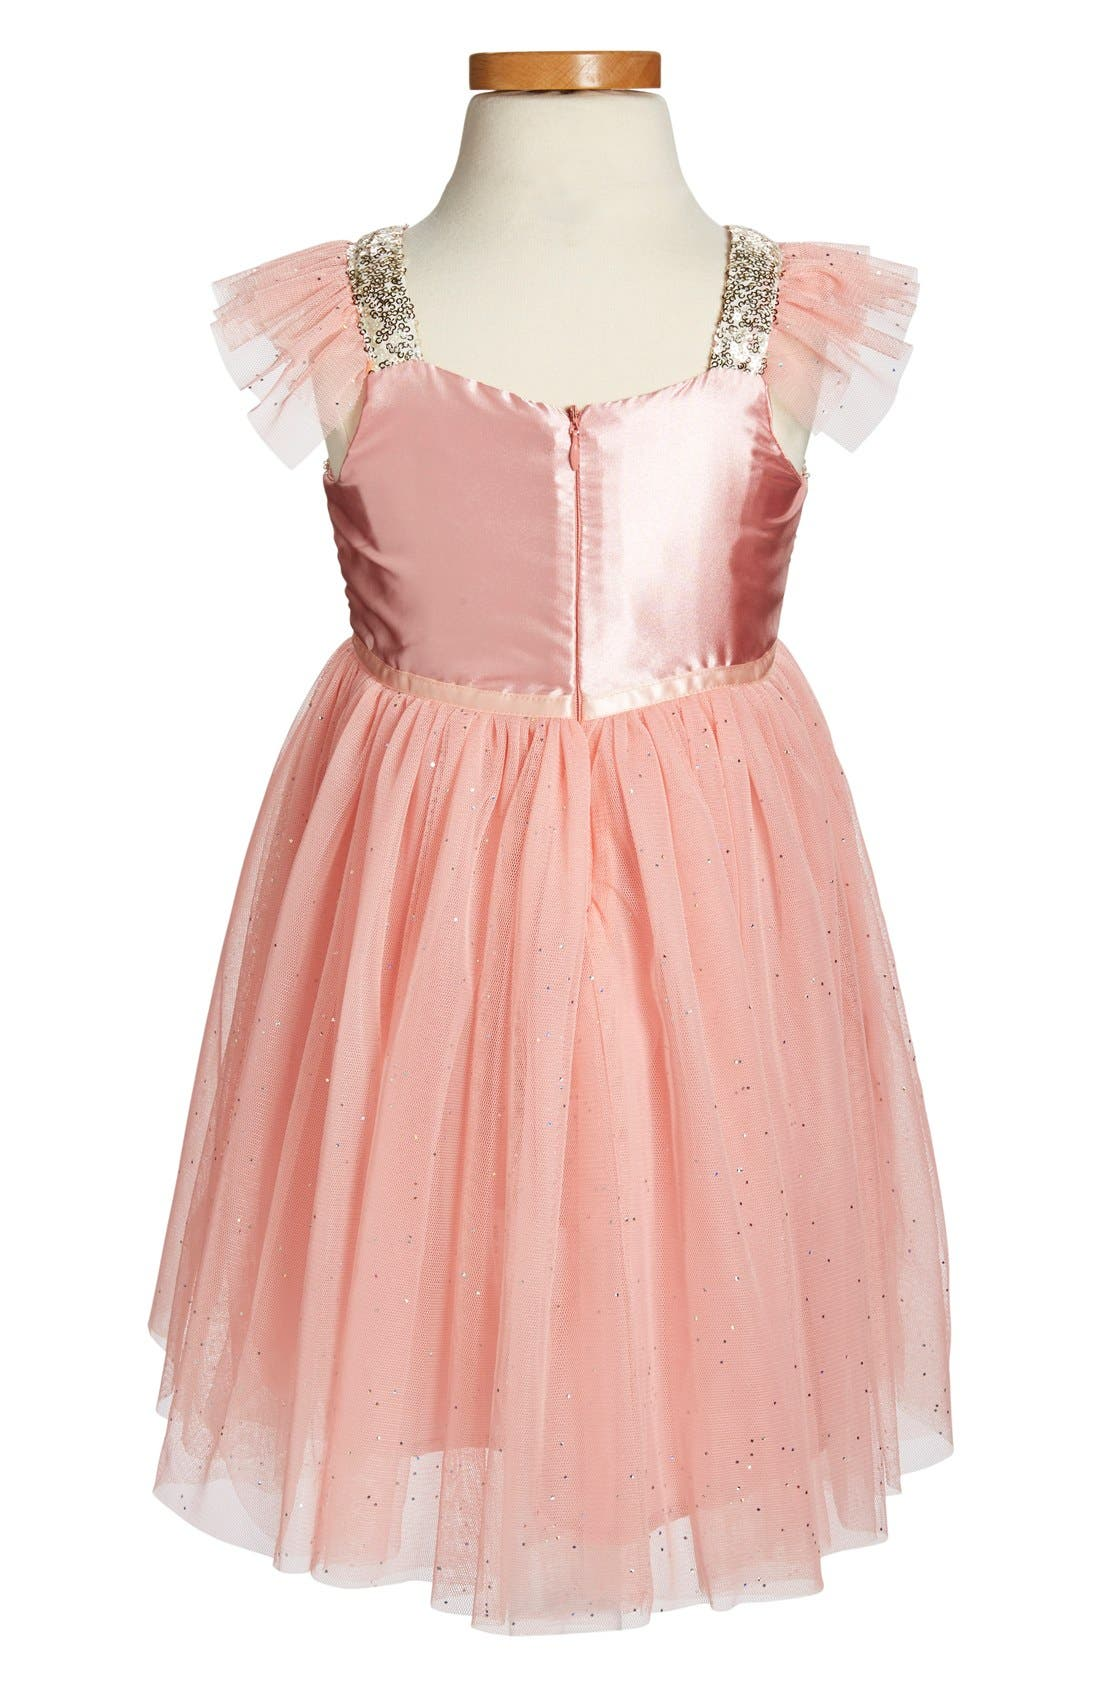 POPATU, Sequin Bodice Tulle Dress, Alternate thumbnail 2, color, PEACH